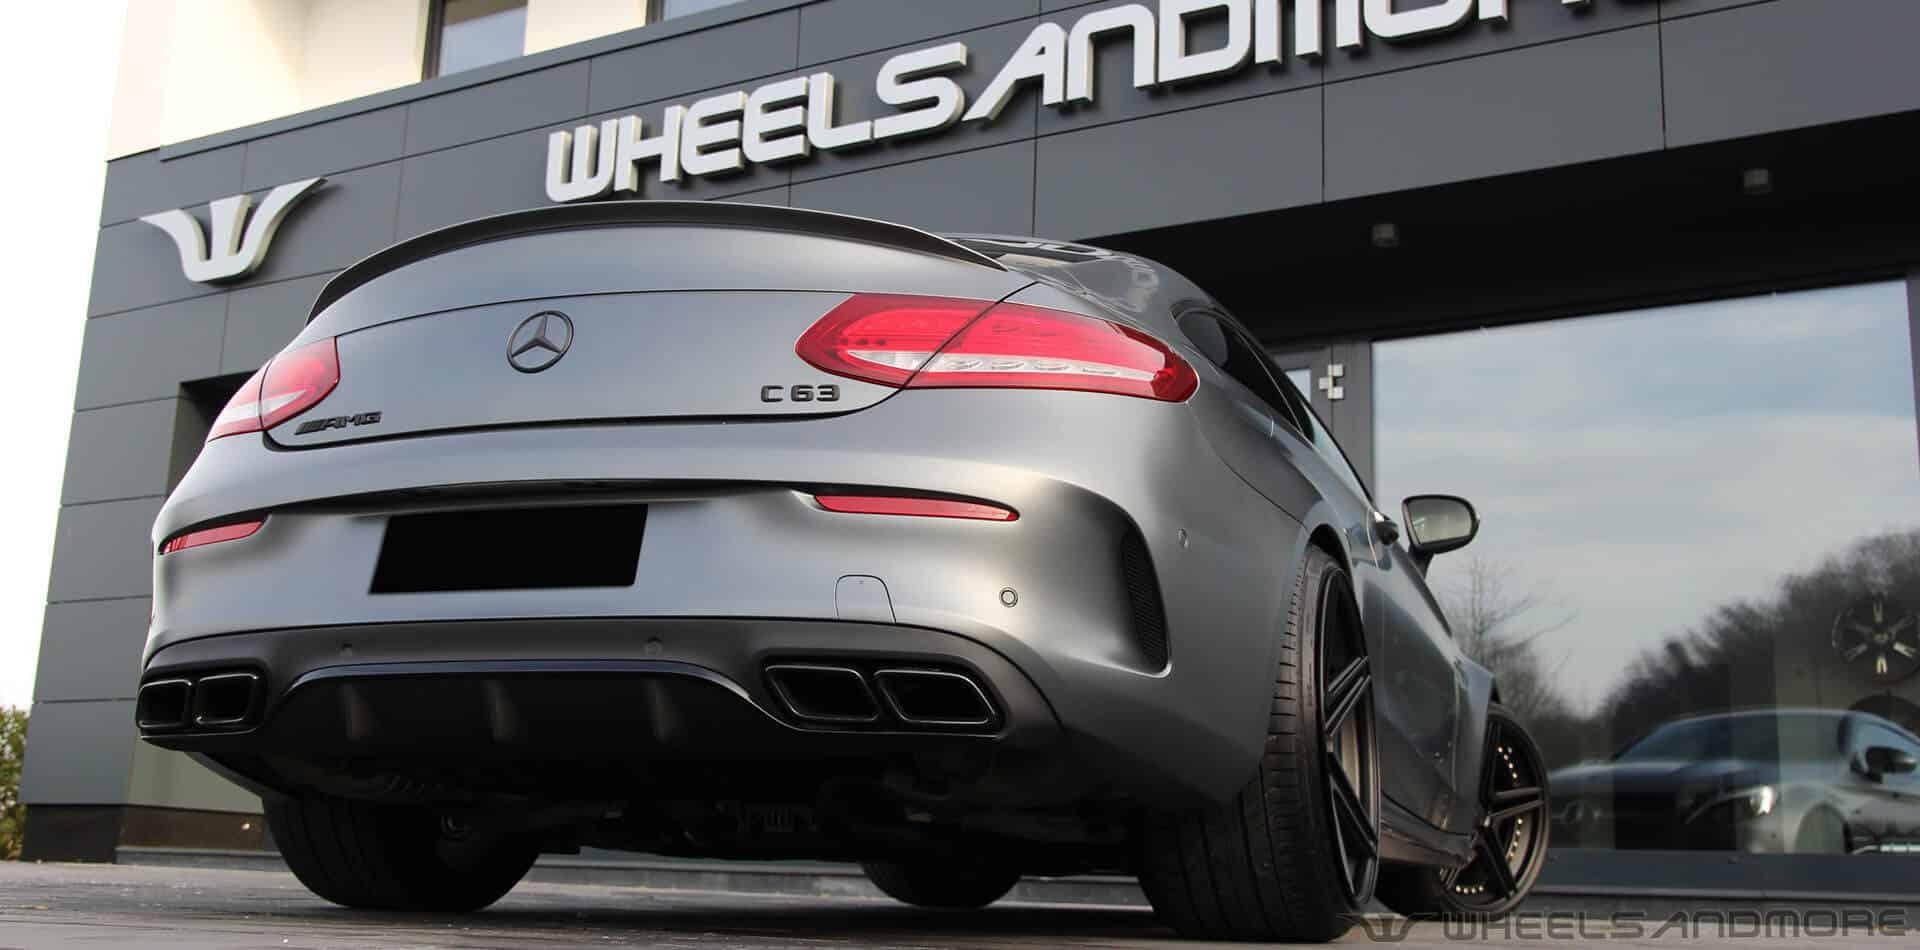 Mercedes C63 AMG Tuning | Wheelsandmore › Wheelsandmore Tuning